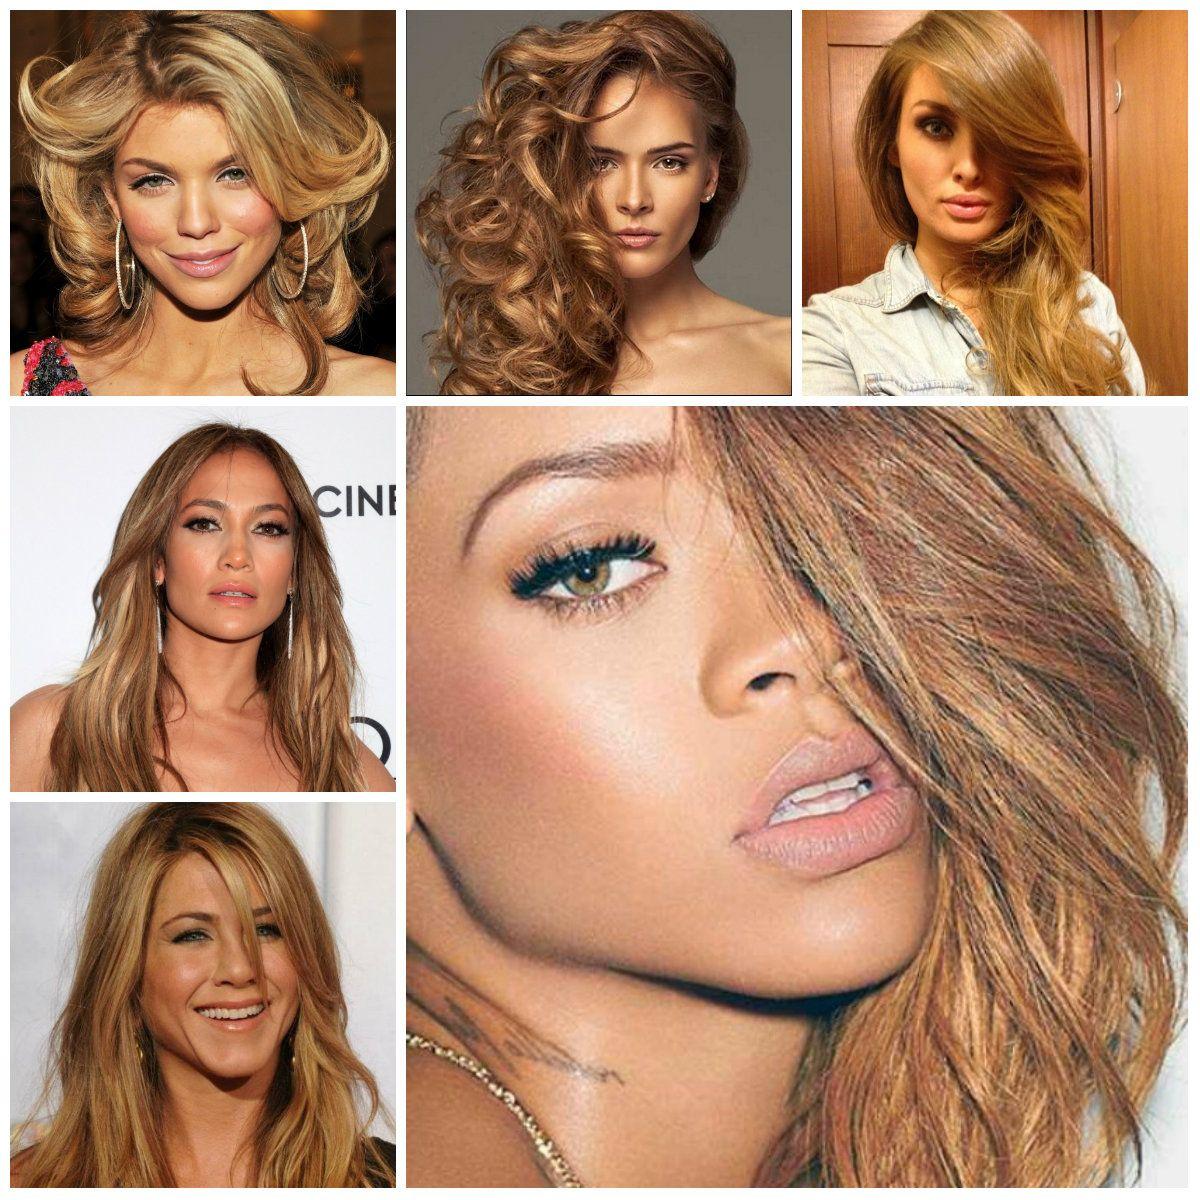 Hair Colors For Caramel Skin Tones Best Hair Color For Black Natural Hair Check Mor Skin Tone Hair Color Hair Color For Warm Skin Tones Hair Color For Morena